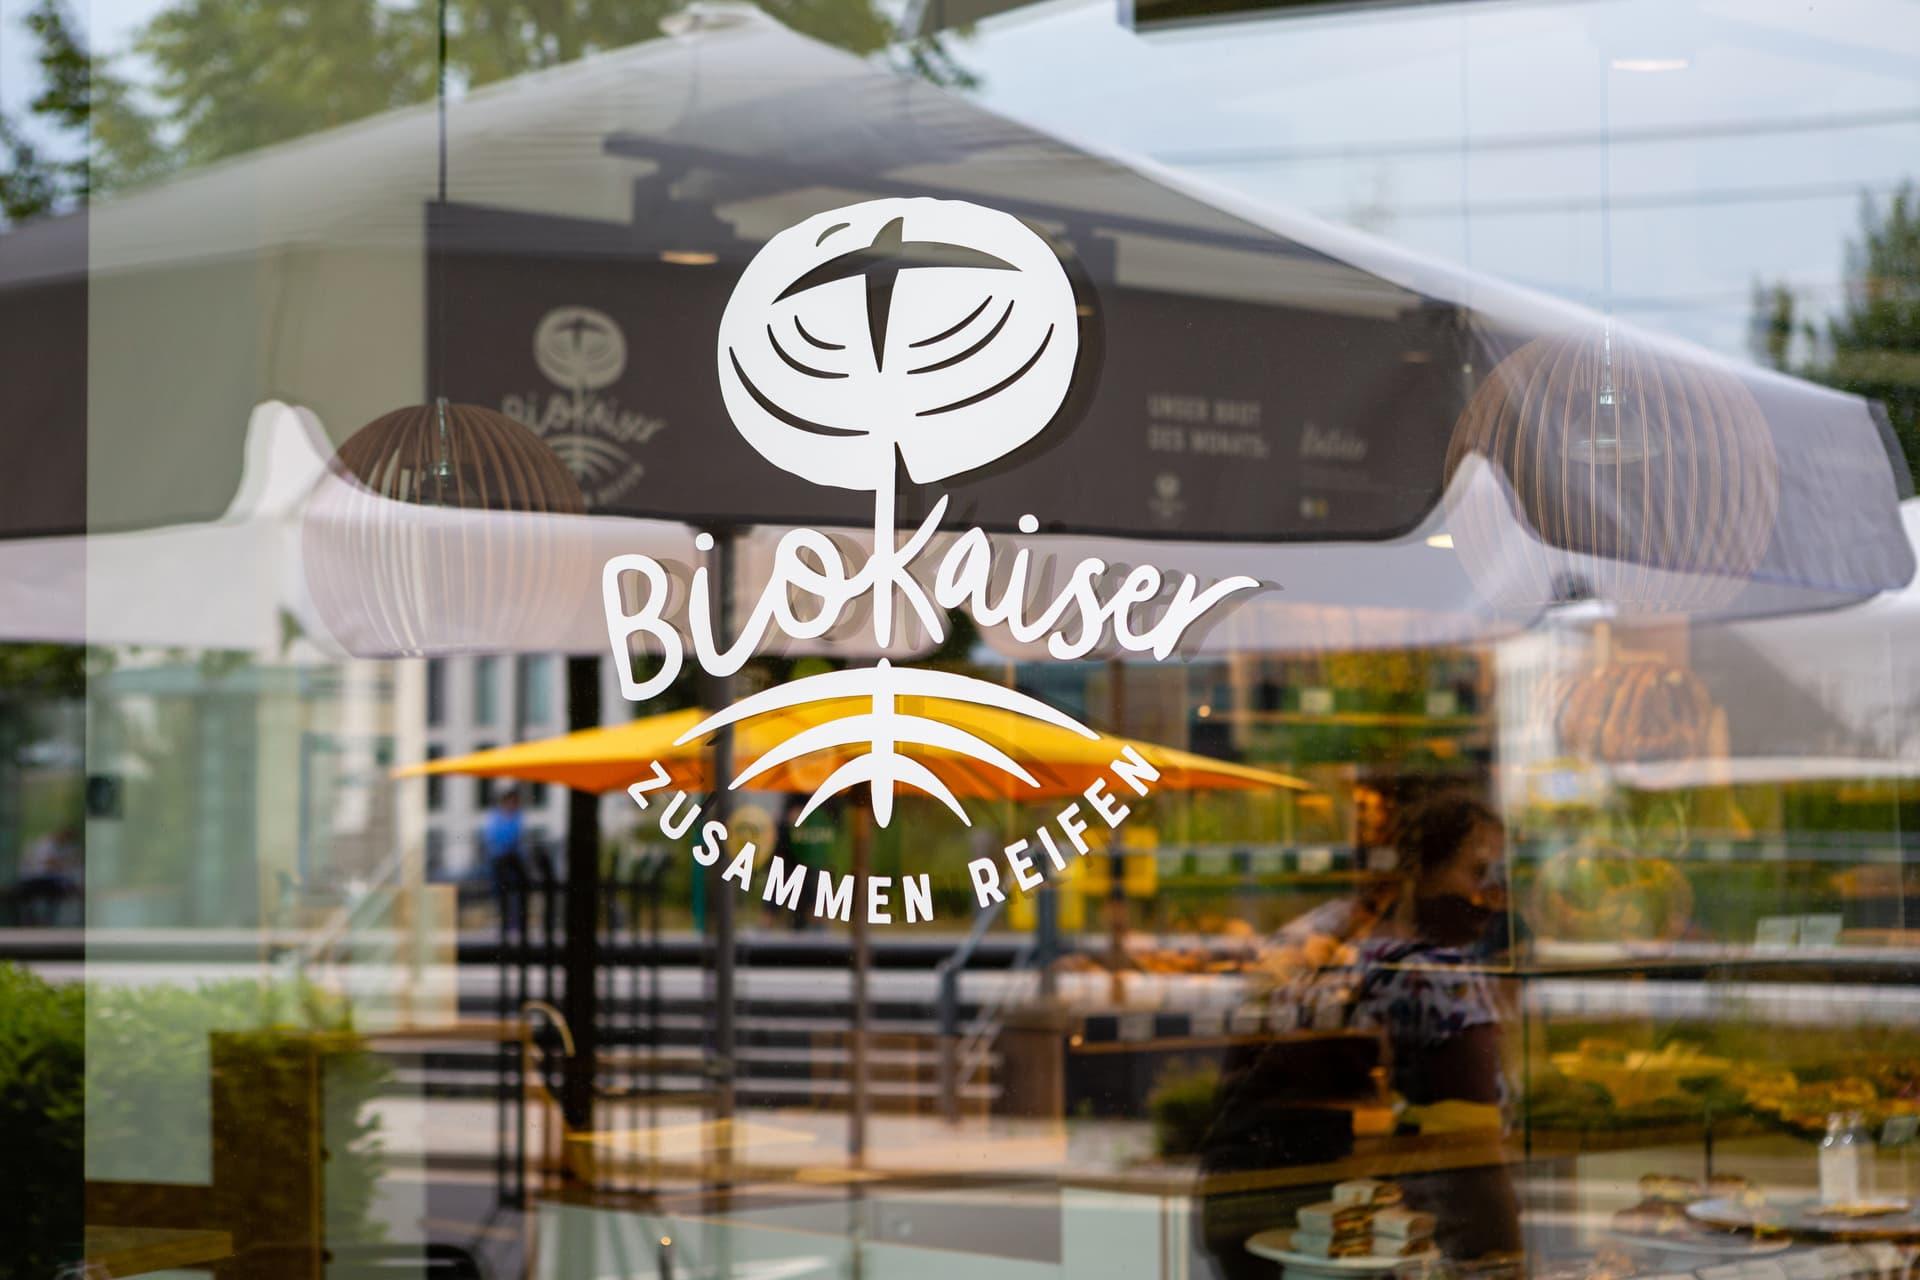 BioKaiser in Frankfurt-Riedberg